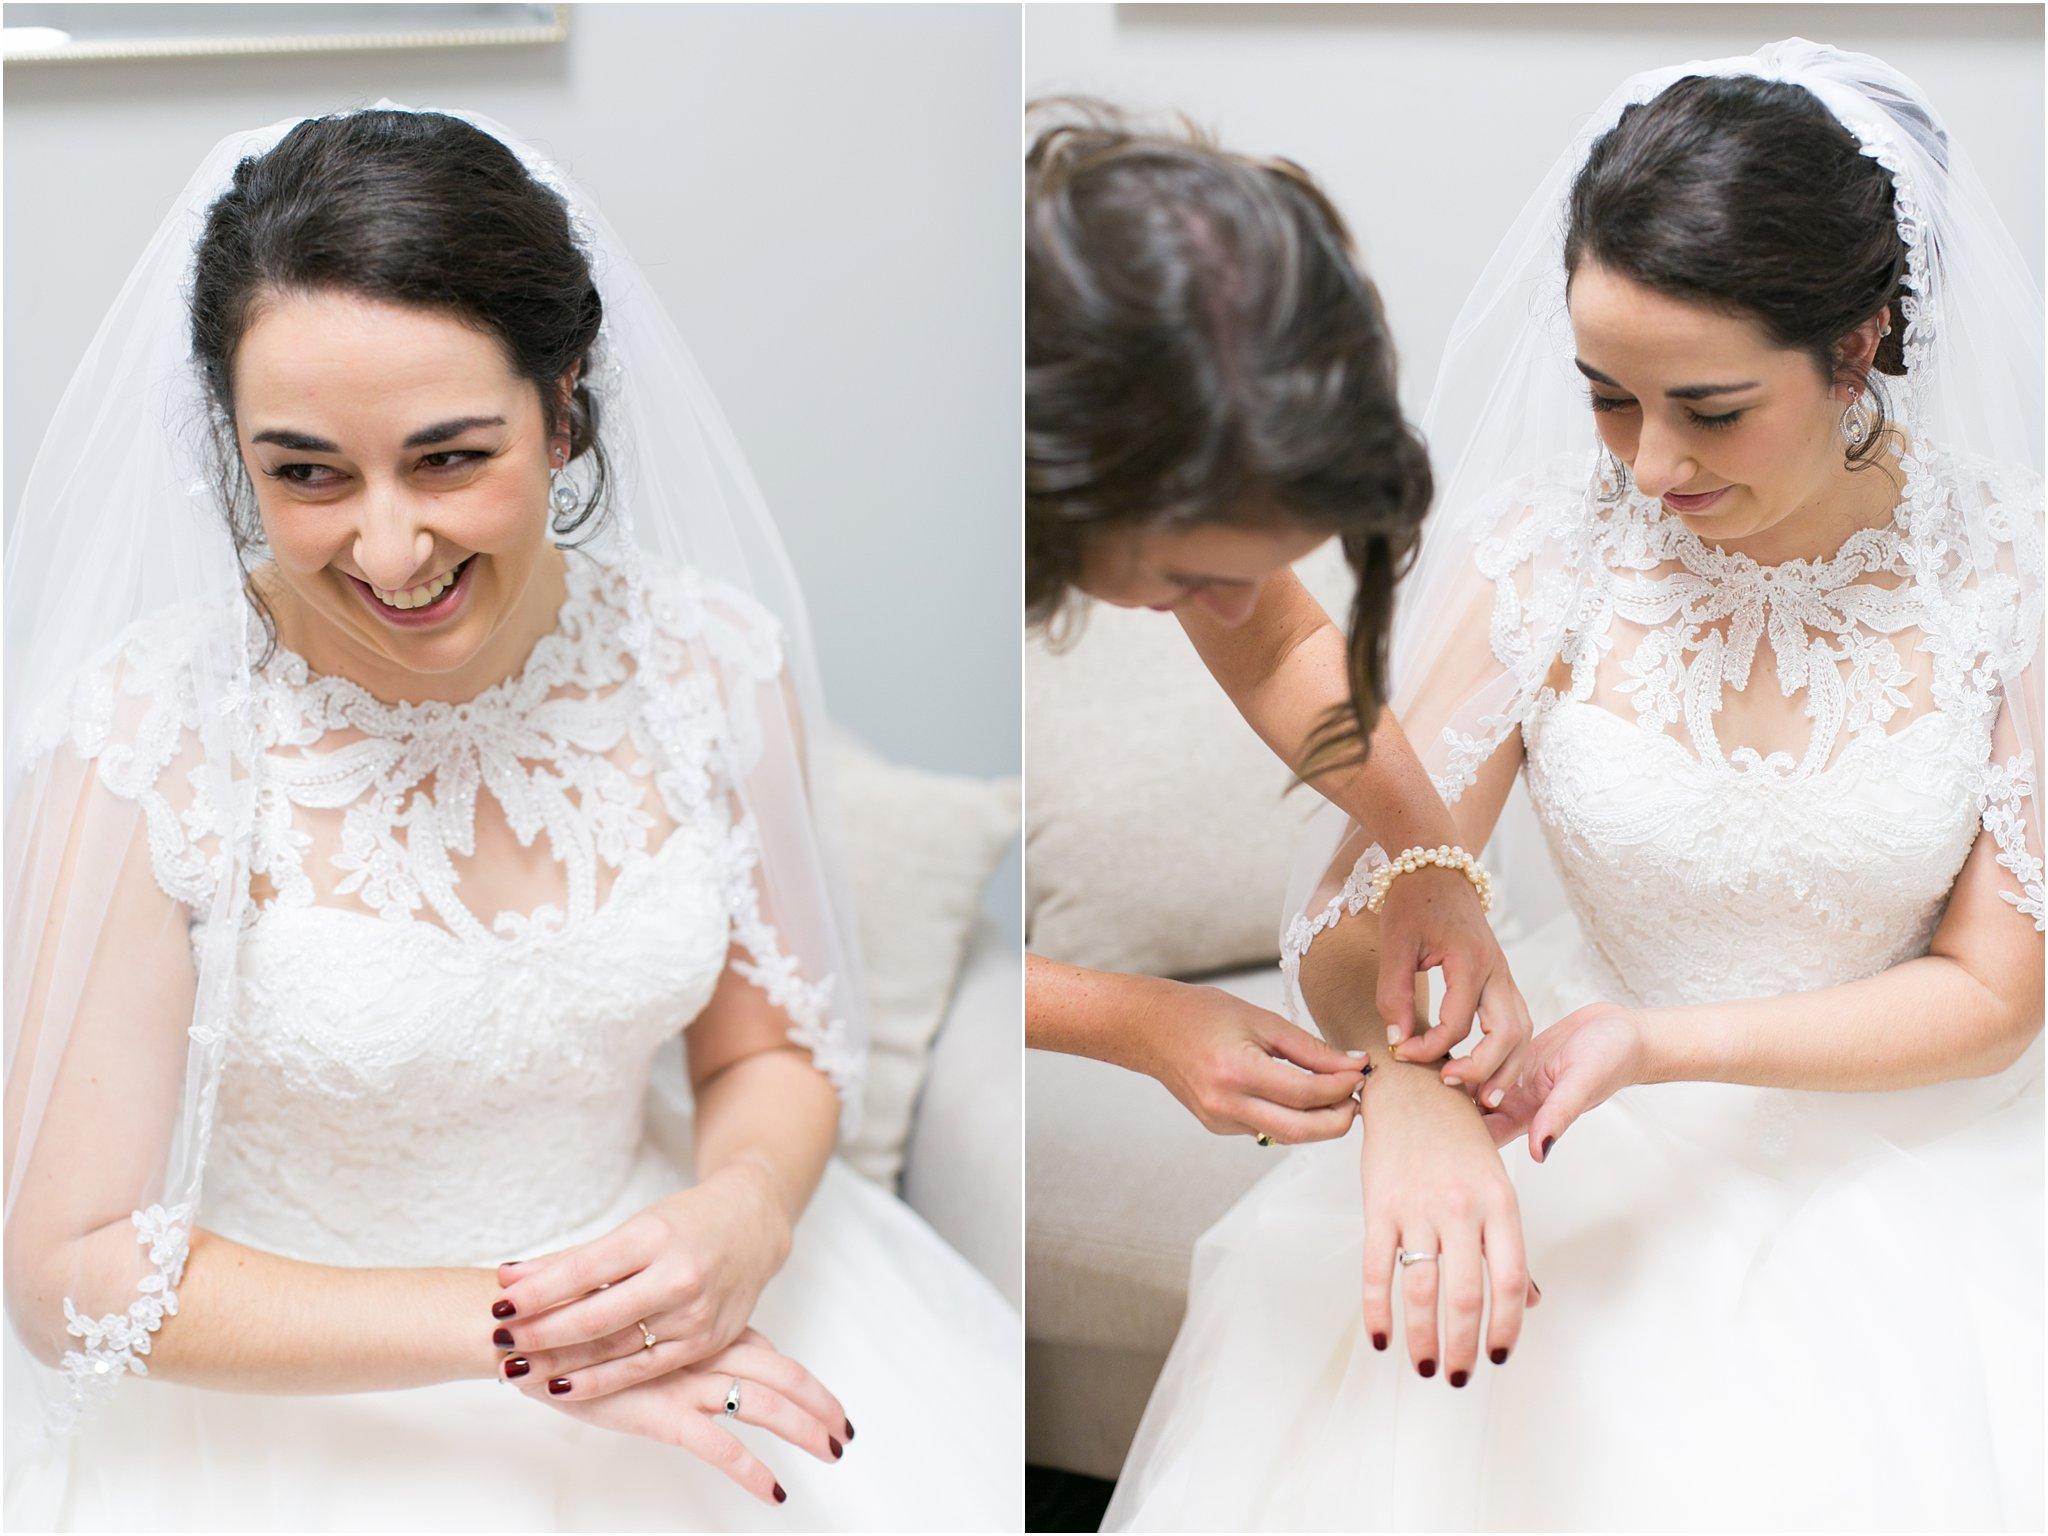 jessica_ryan_photography_virginia_wedding_photographer_wedding_hurricane_norfolk_botanical_gardens_hurricane_matthew_wedding_3555